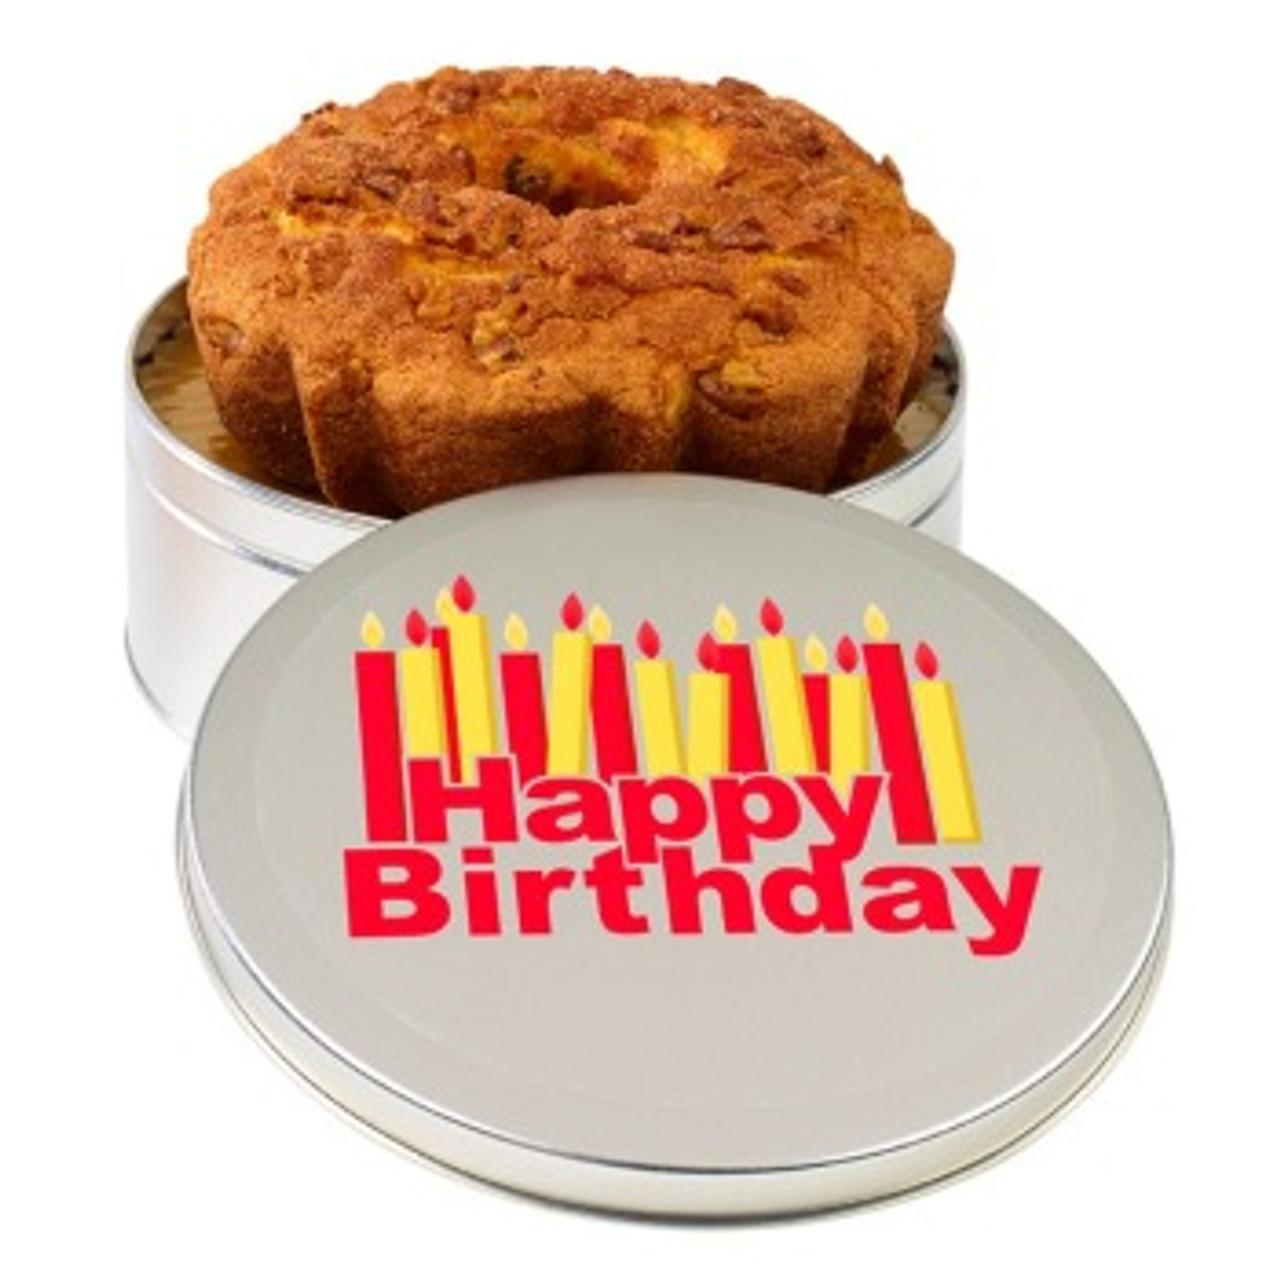 Wondrous Cinnamon Walnut Coffee Cake In Happy Birthday Tin All Wrapped Up Personalised Birthday Cards Vishlily Jamesorg